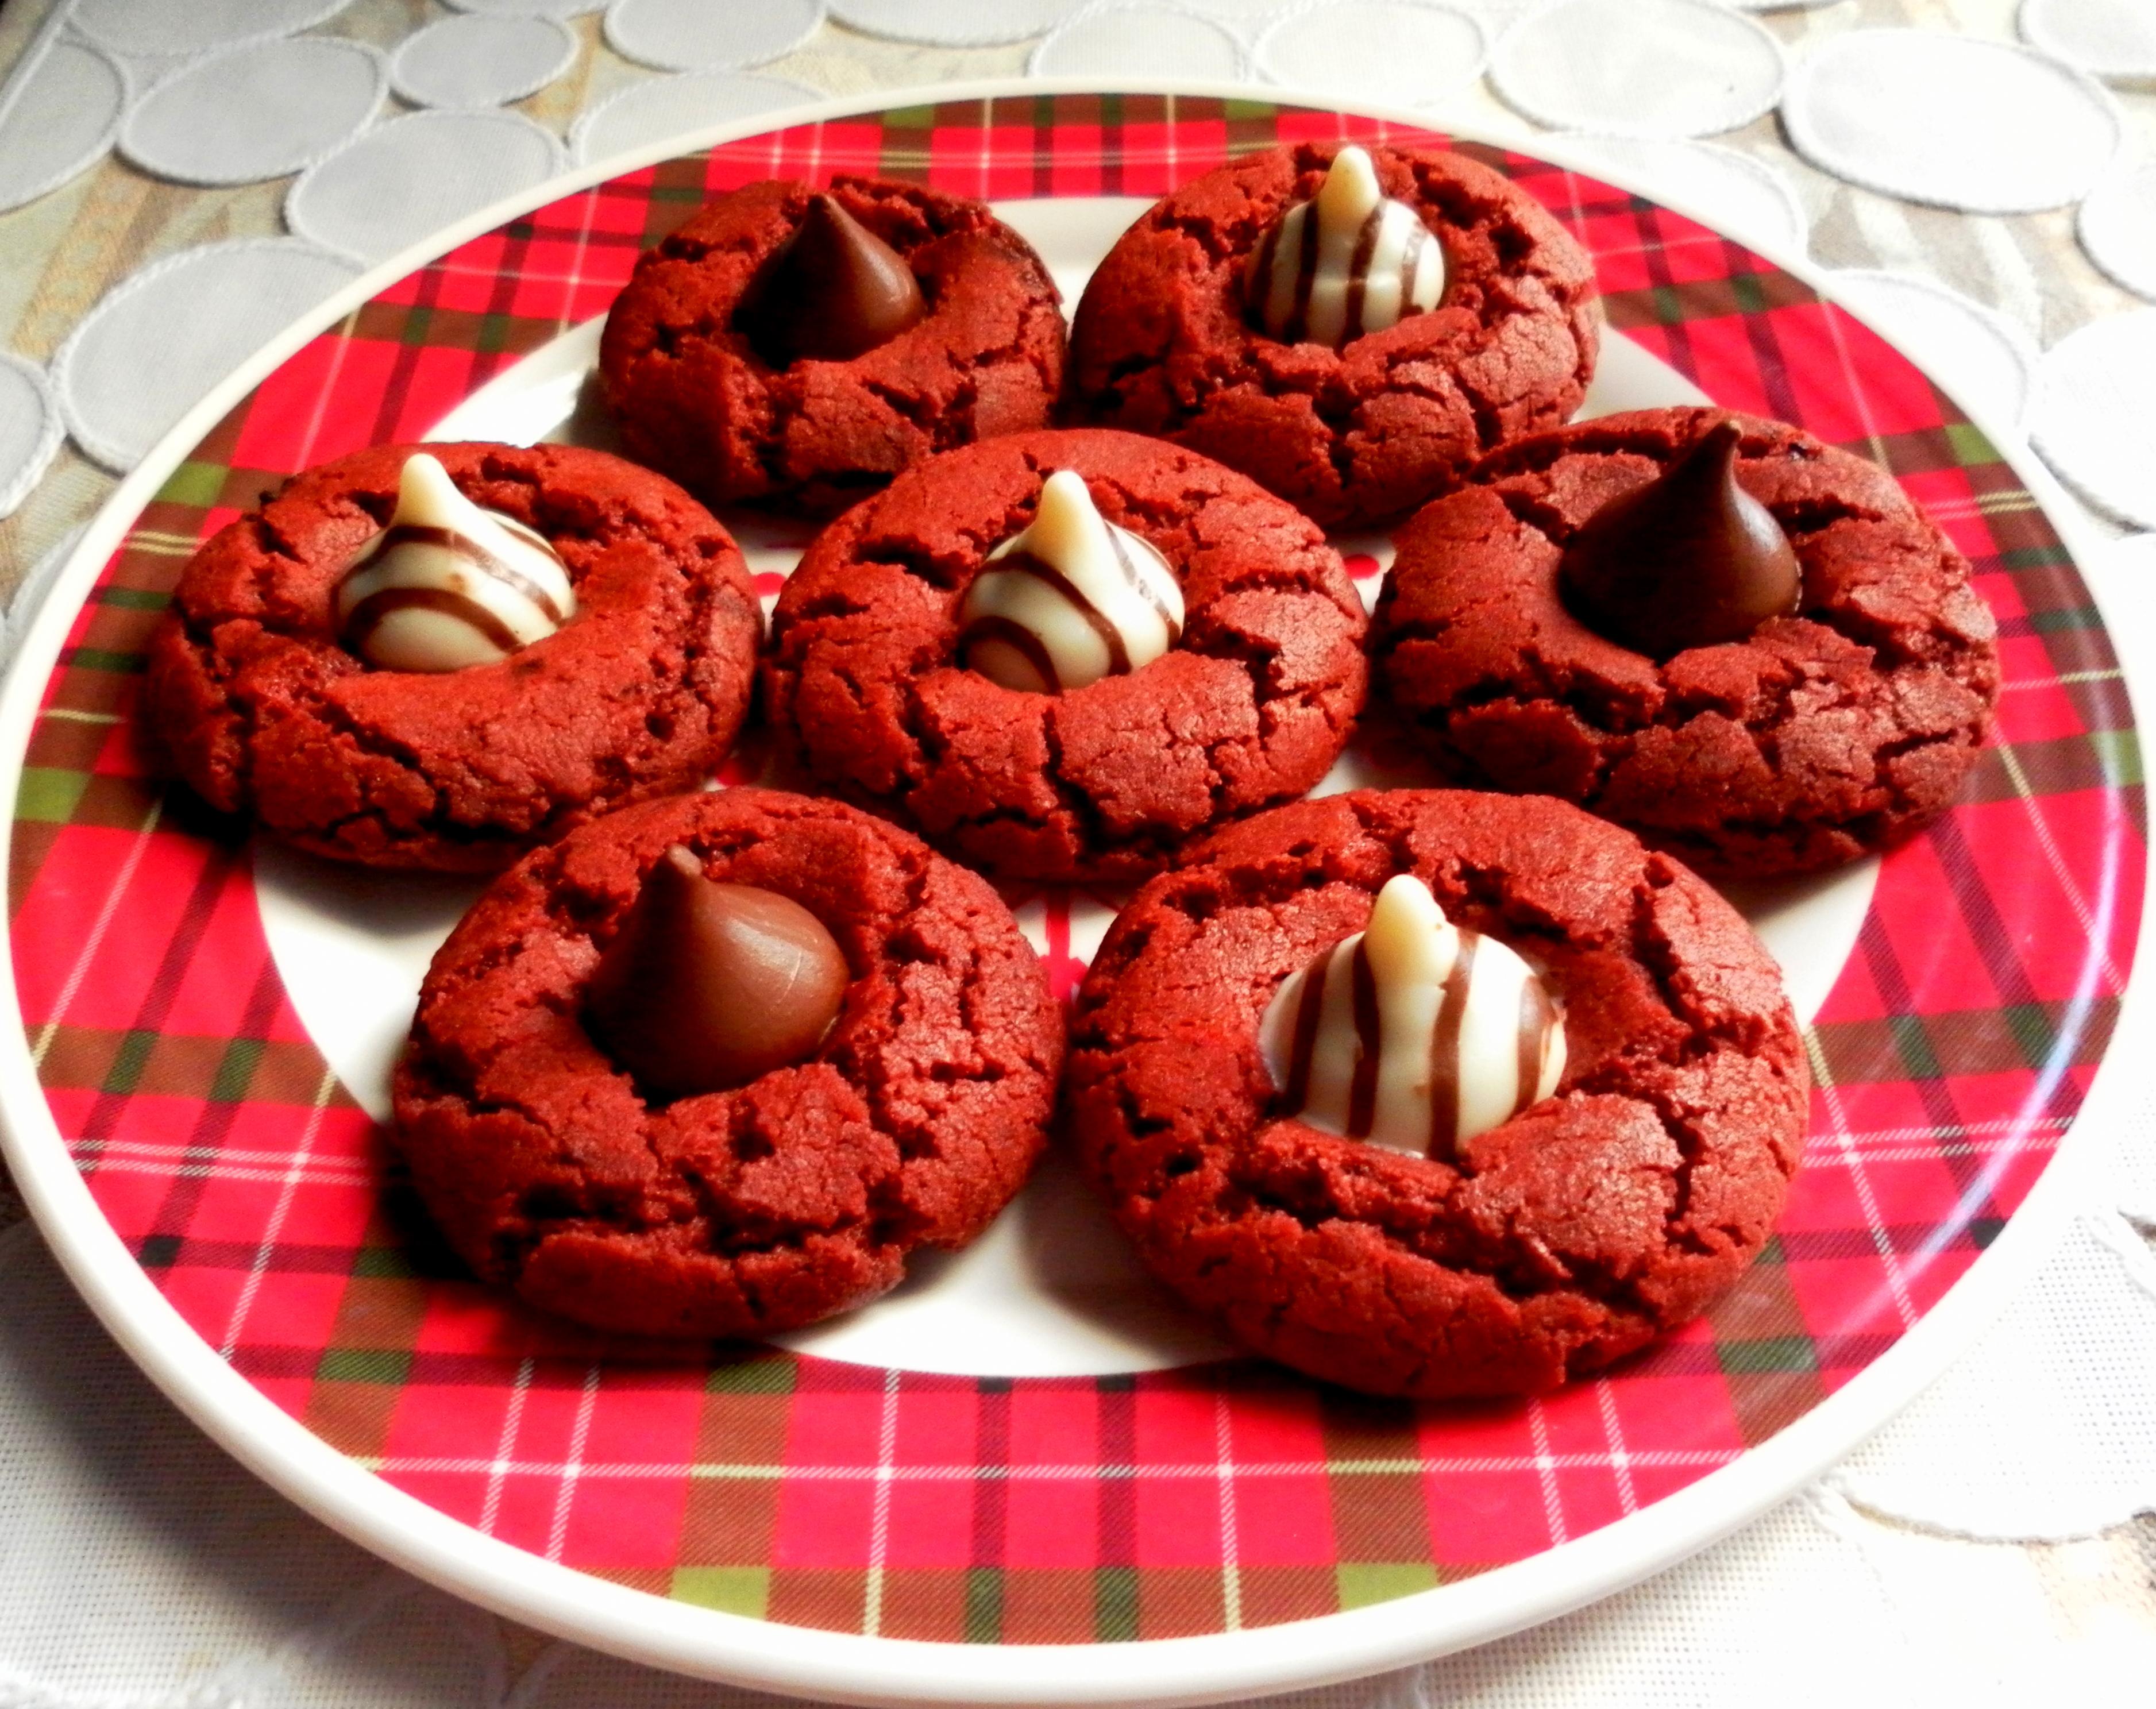 Yummy Red Velvet Cake Recipe